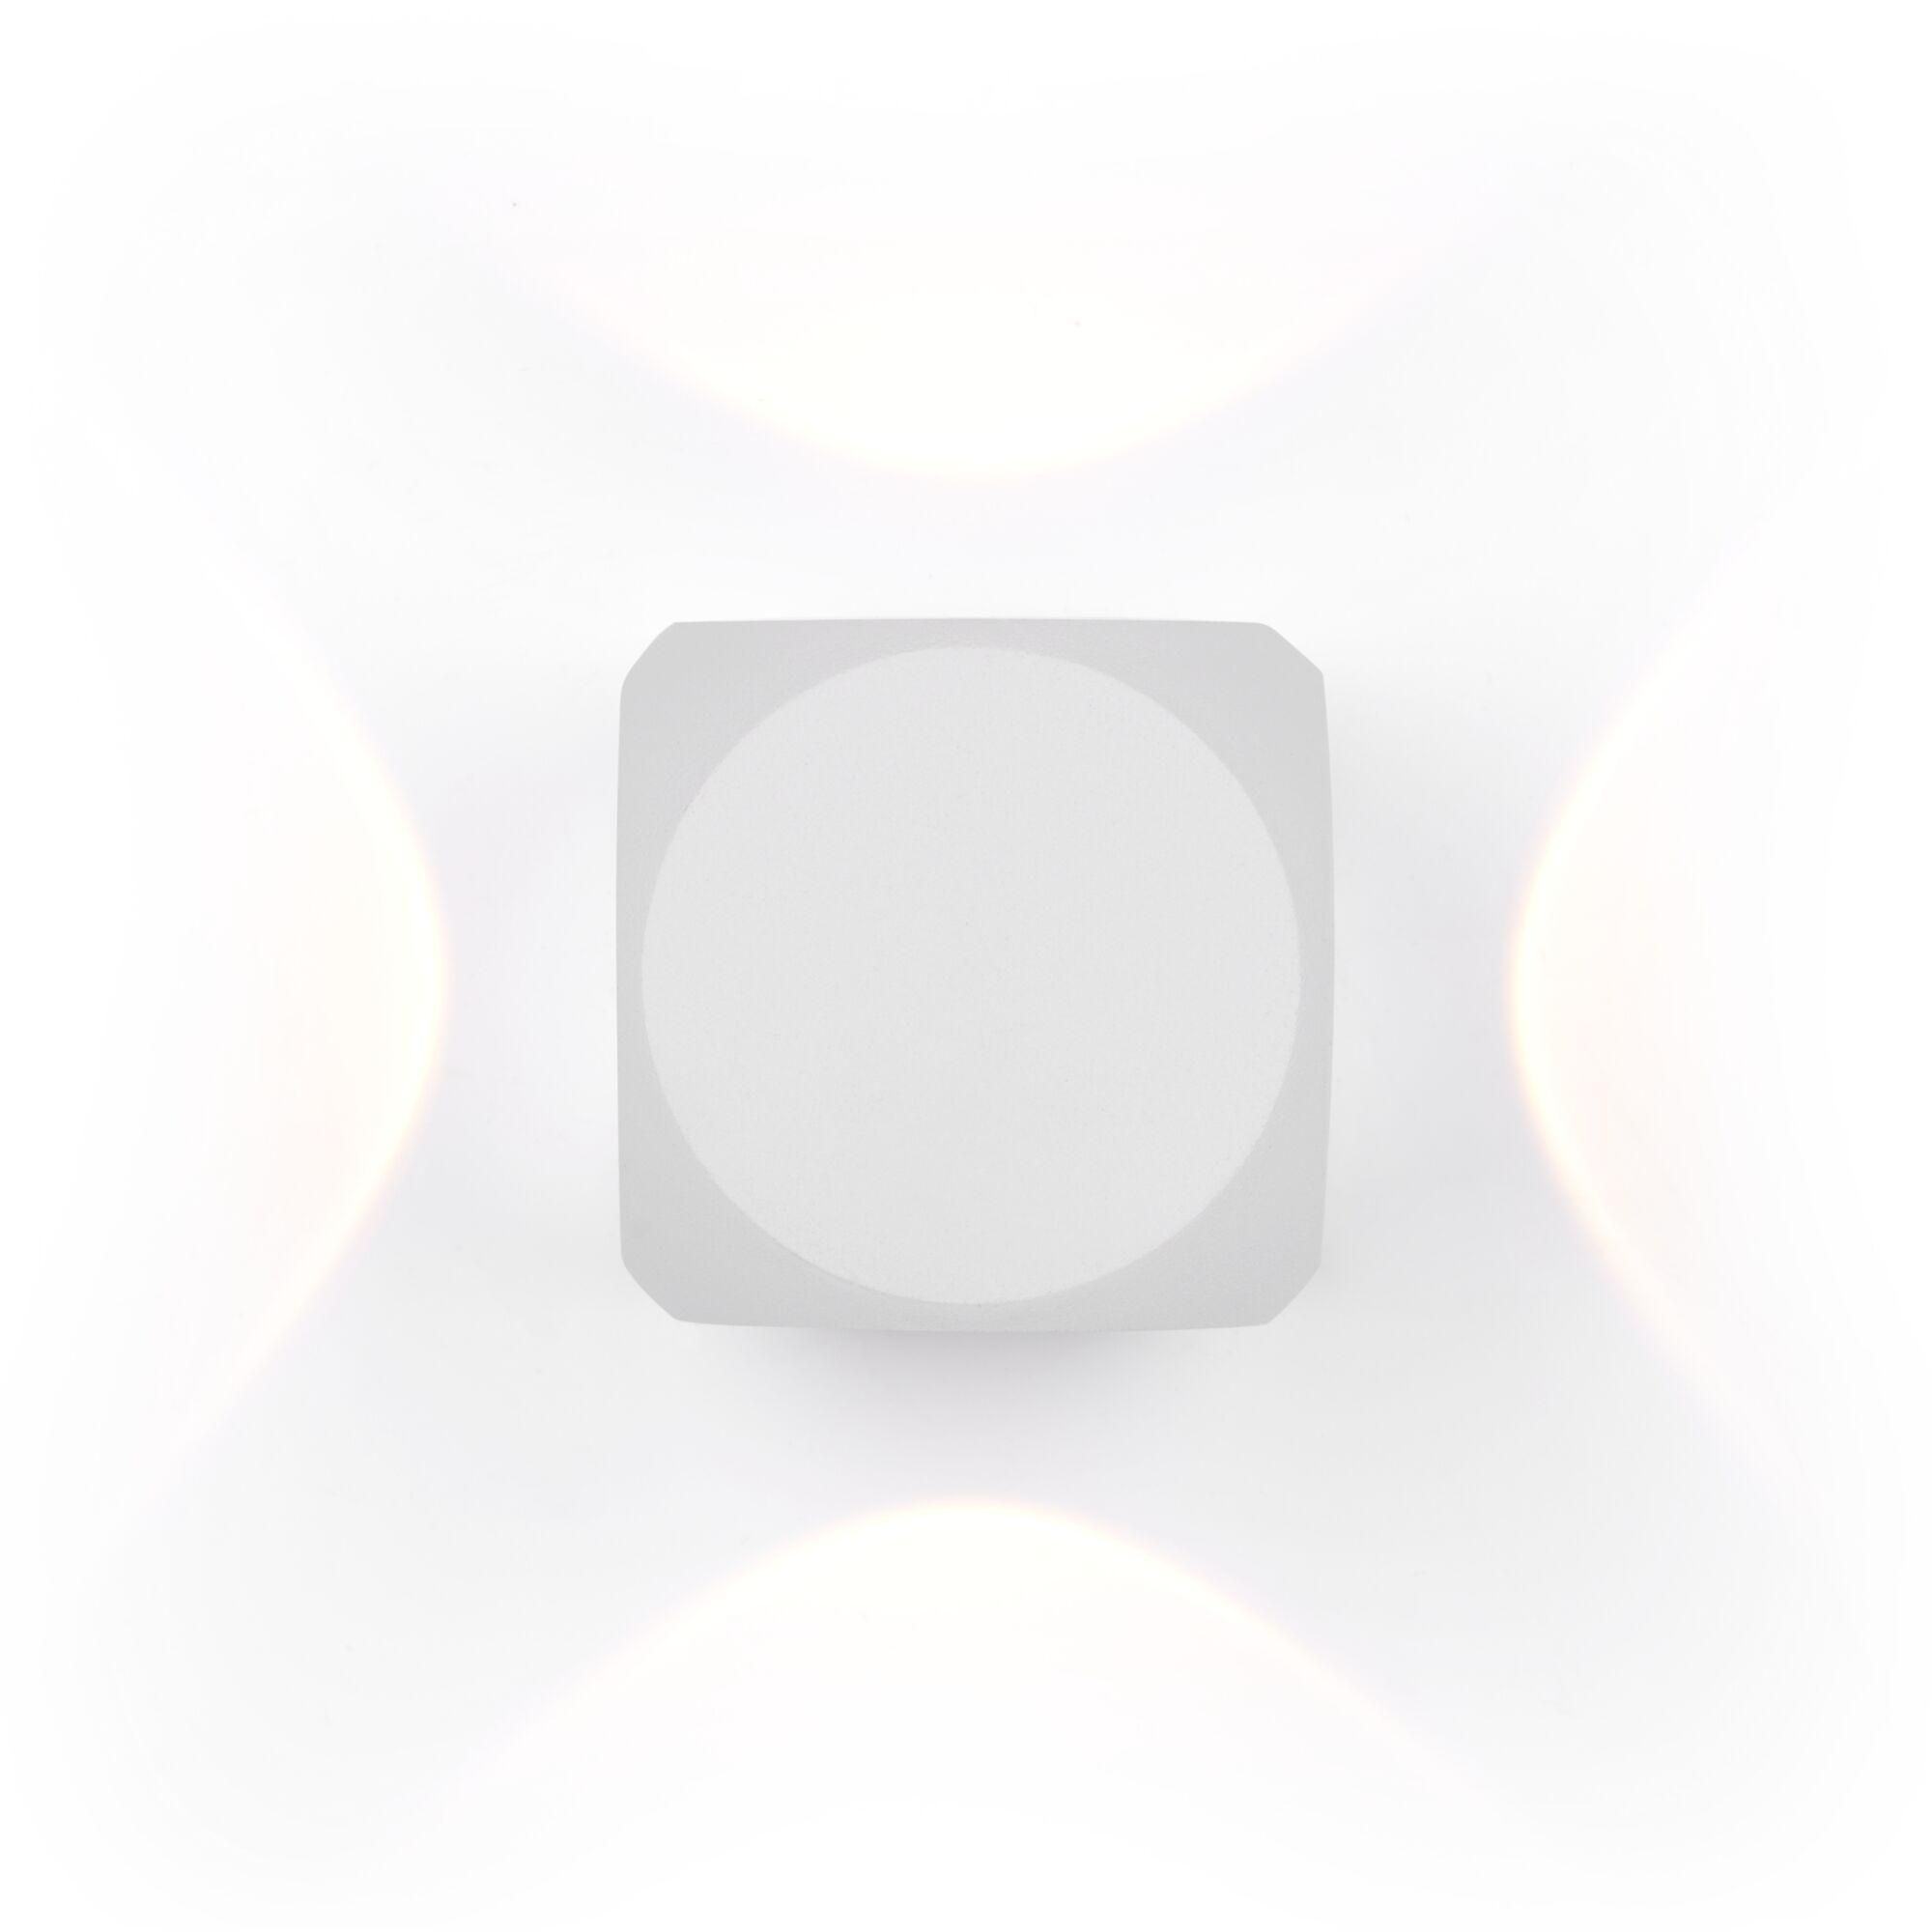 Настенный светильник Maytoni O014WL L4W